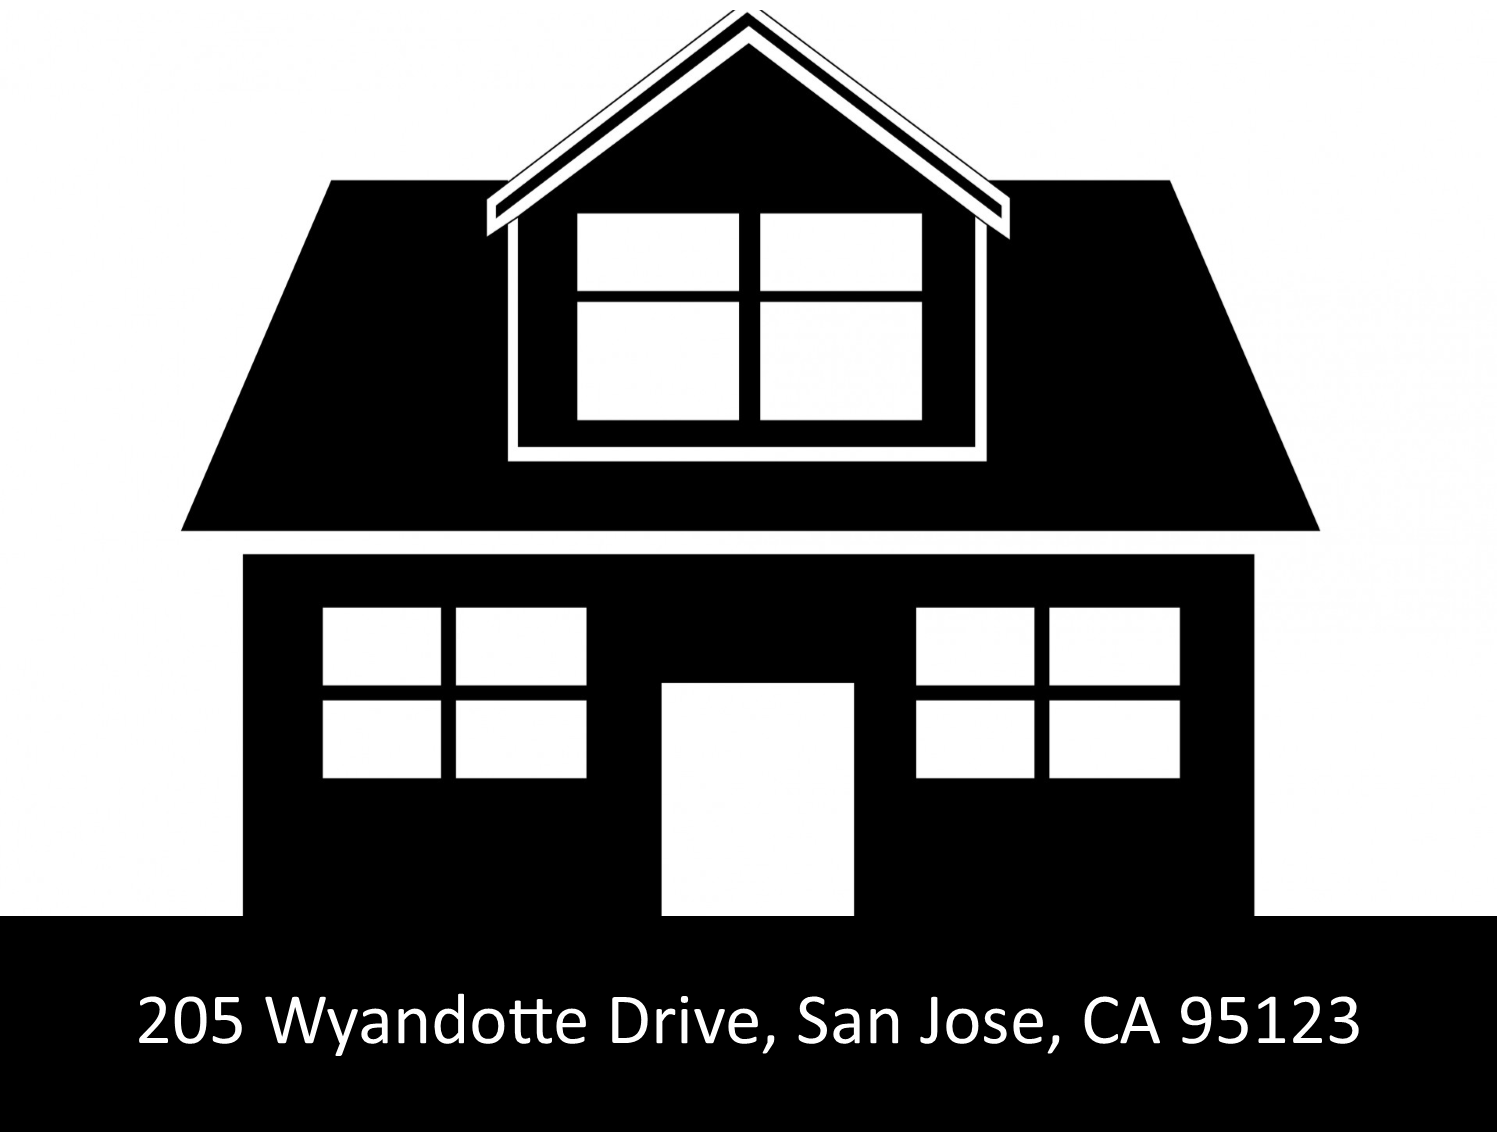 205 Wyandotte Drive, San Jose, CA 95123